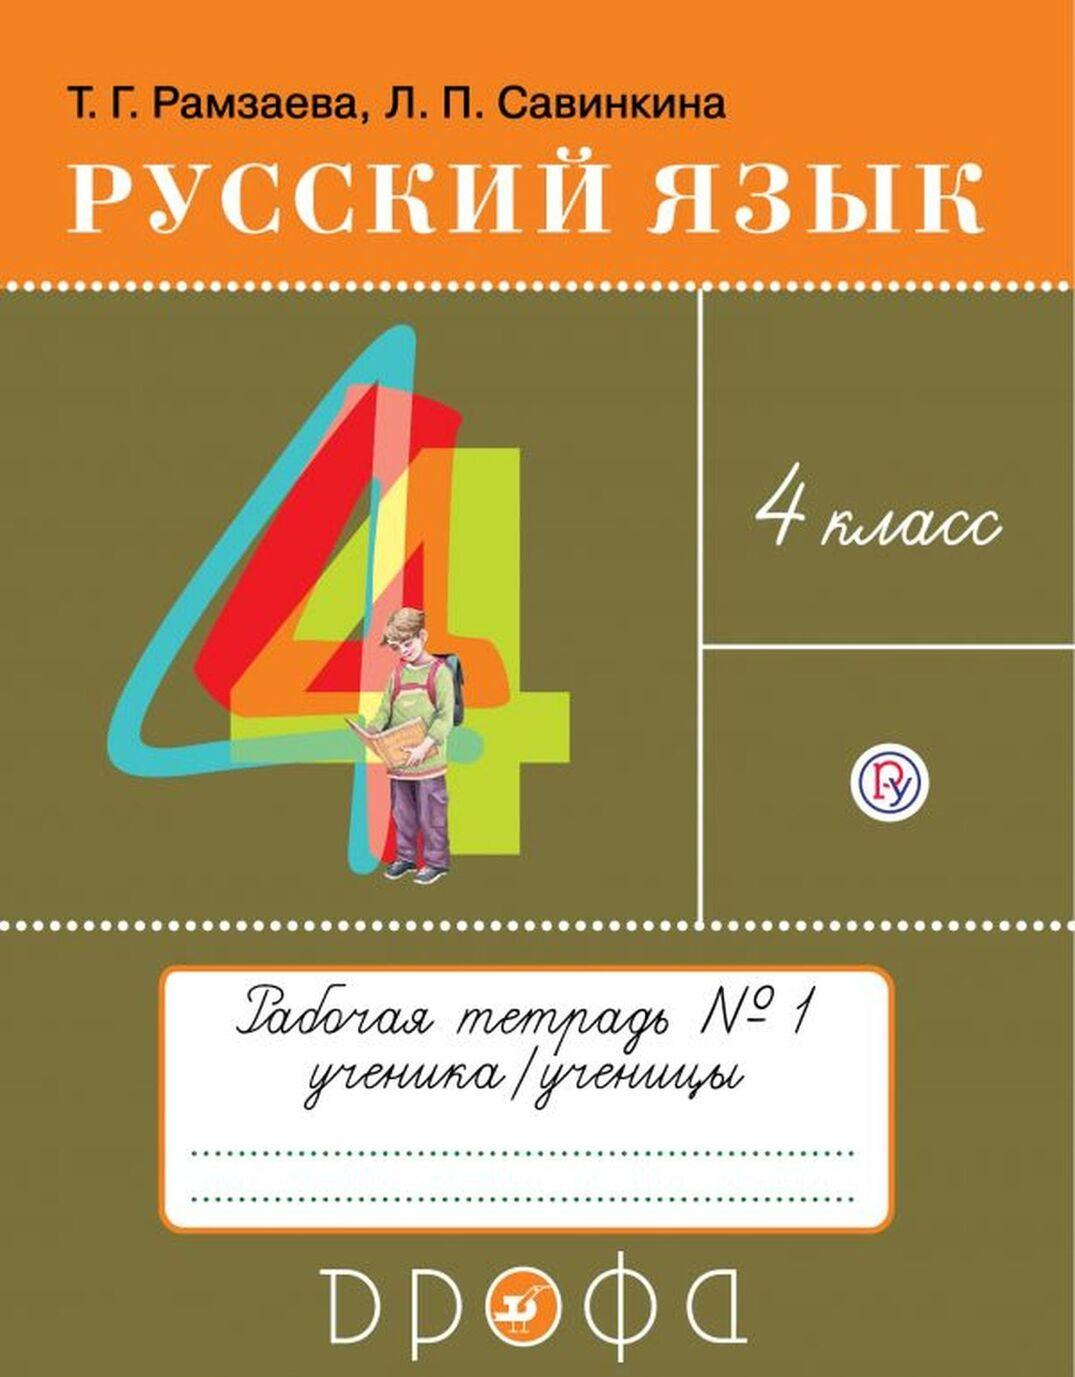 Russkij jazyk. 4 klass. Rabochaja tetrad. V 2-kh chastjakh. Chast 1 | Ramzaeva Tamara Grigorevna, Savinkina Ljudmila Pavlovna